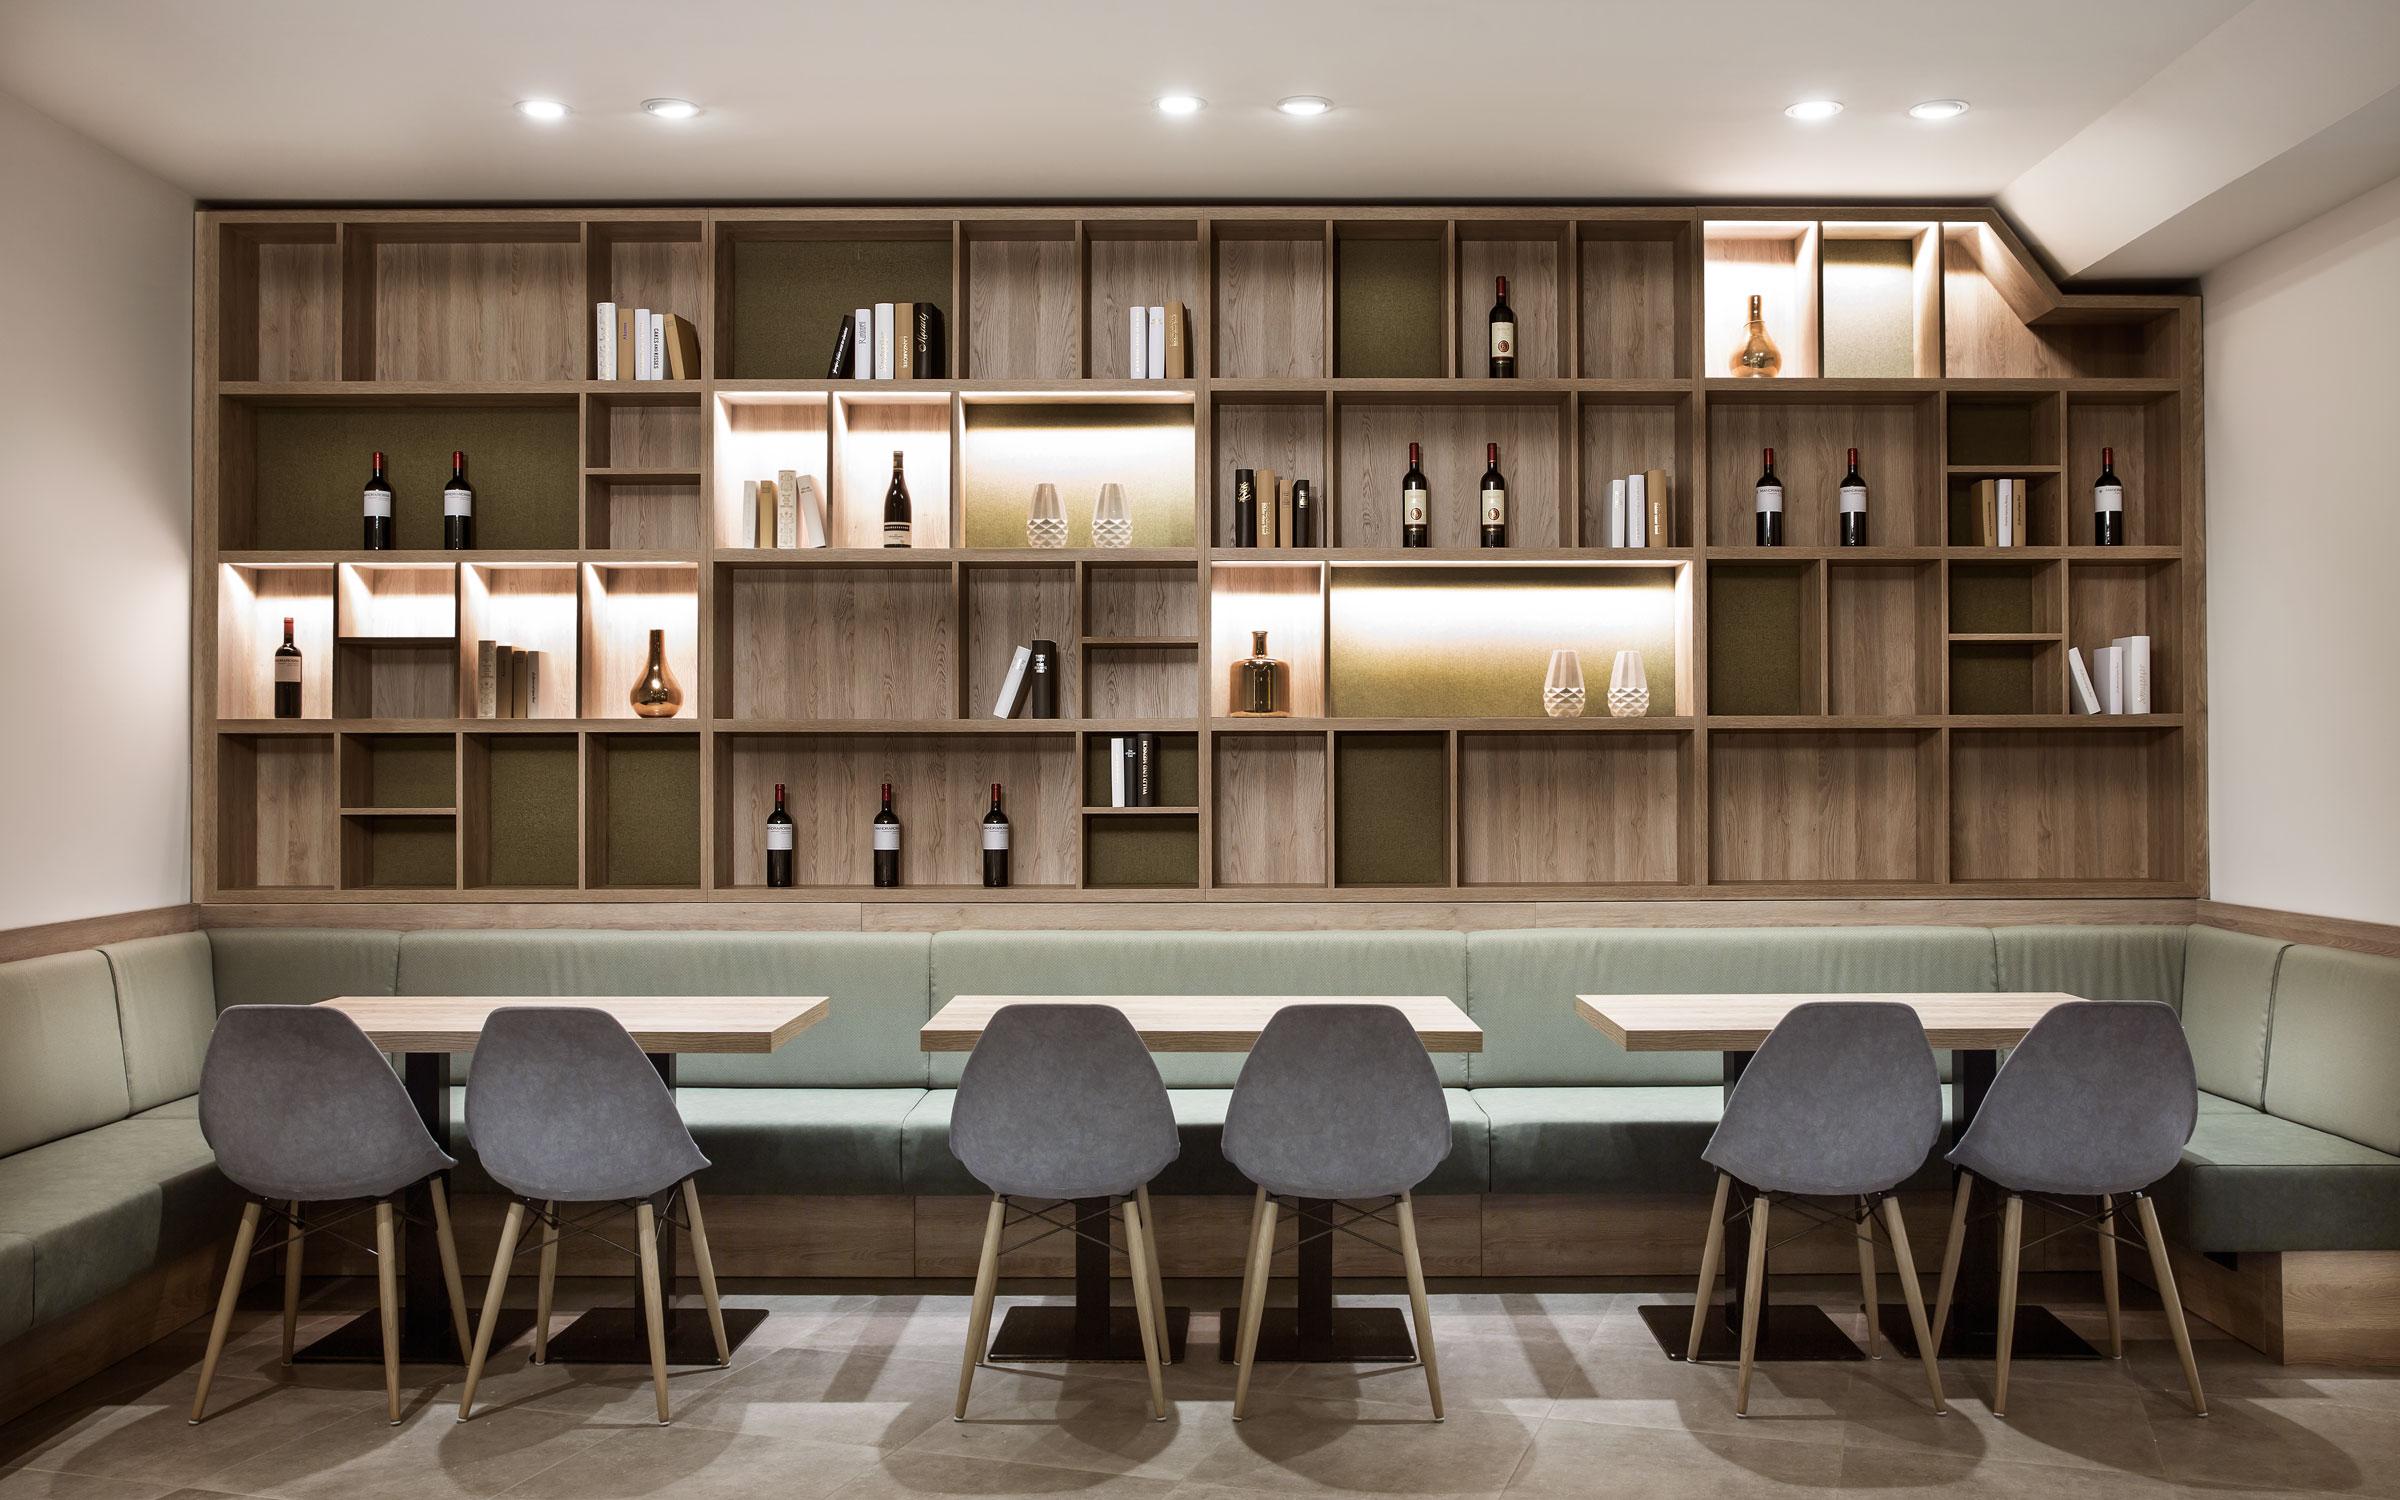 nestor Hotel Neckarsulm | DIA – Dittel Architekten